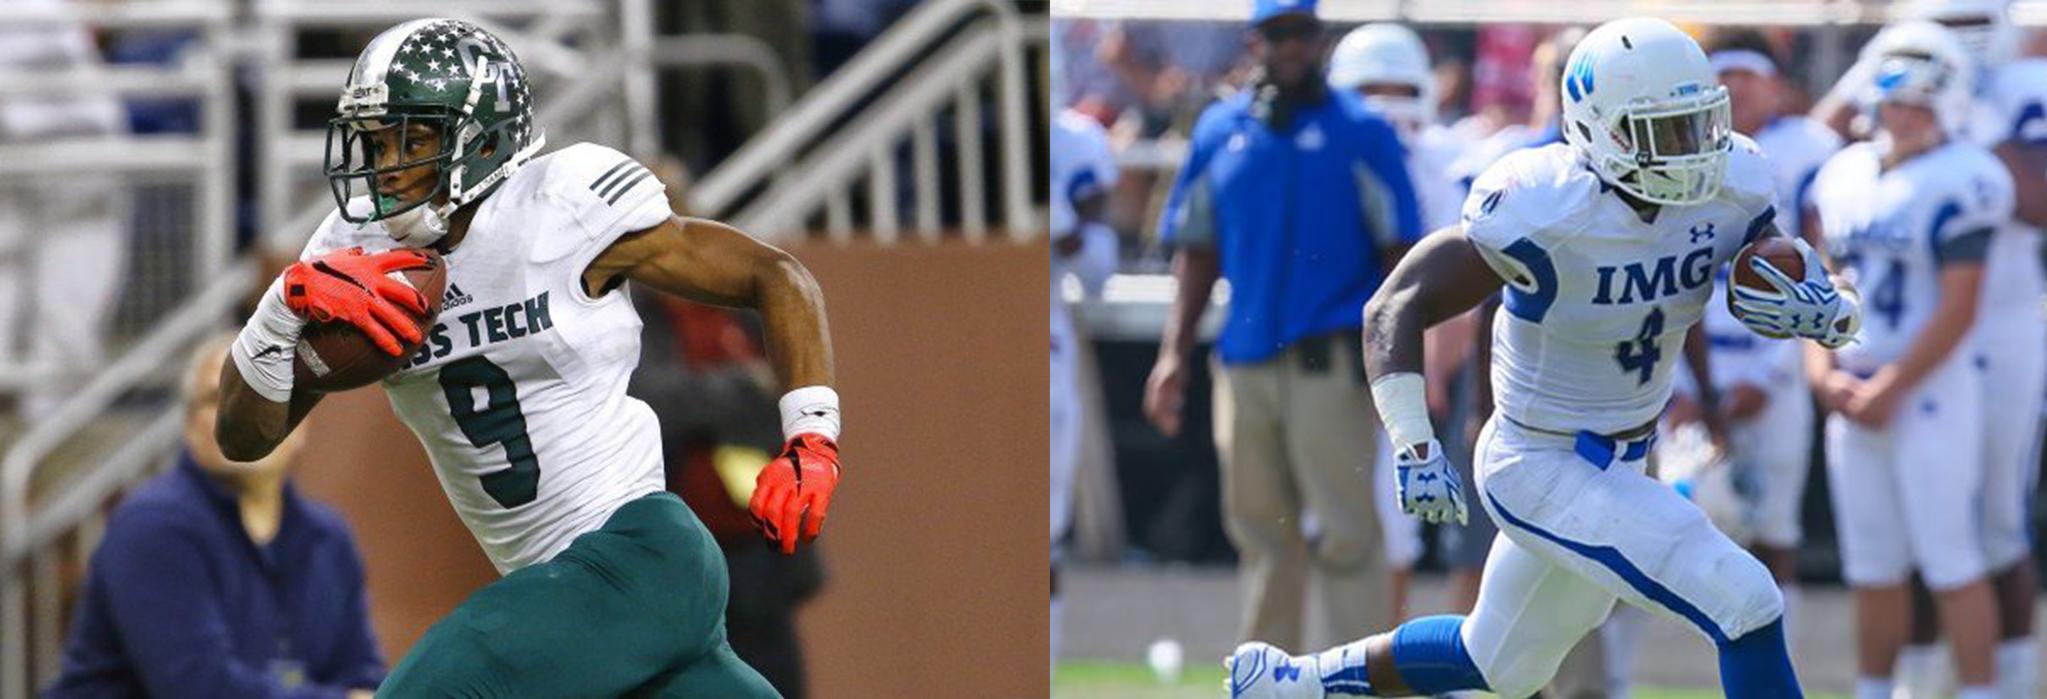 Michigan's five-star commits for 2017: WR Donovan Peoples-Jones(left), LB Jordan Anthony(right).